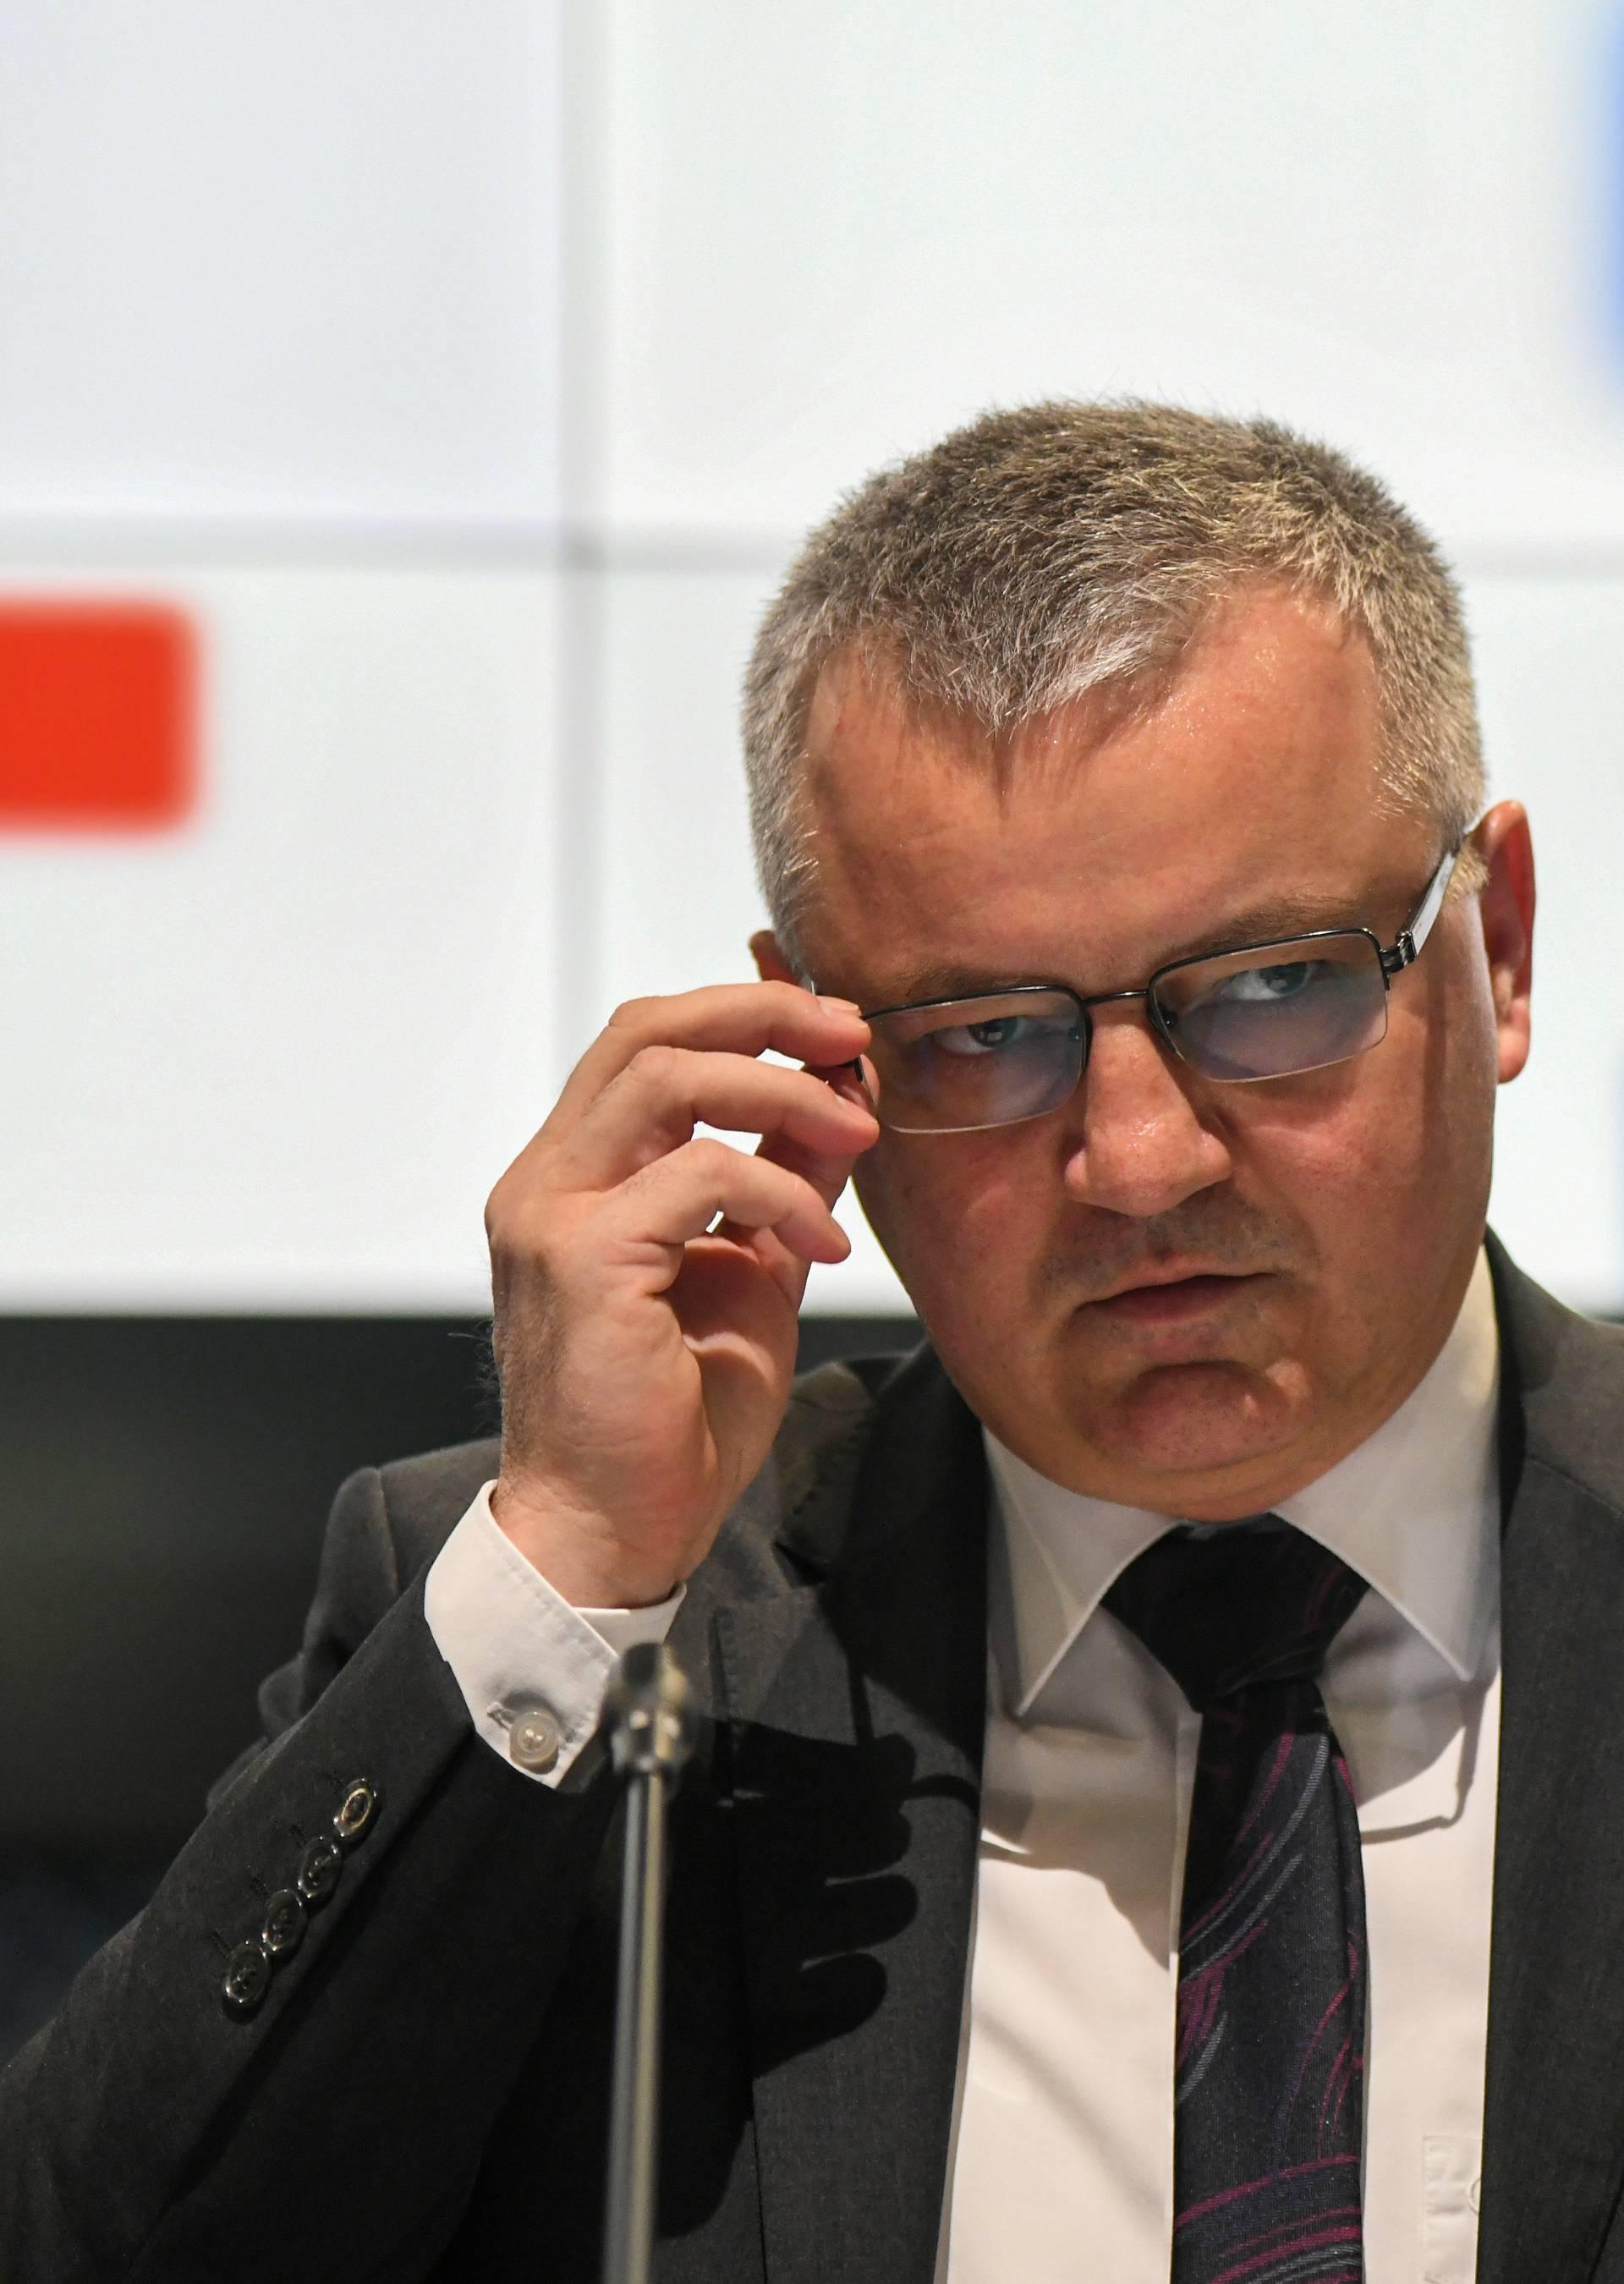 Zagreb: Ministar Darko Horvat na sastanku s ministrima EU putem videolinka